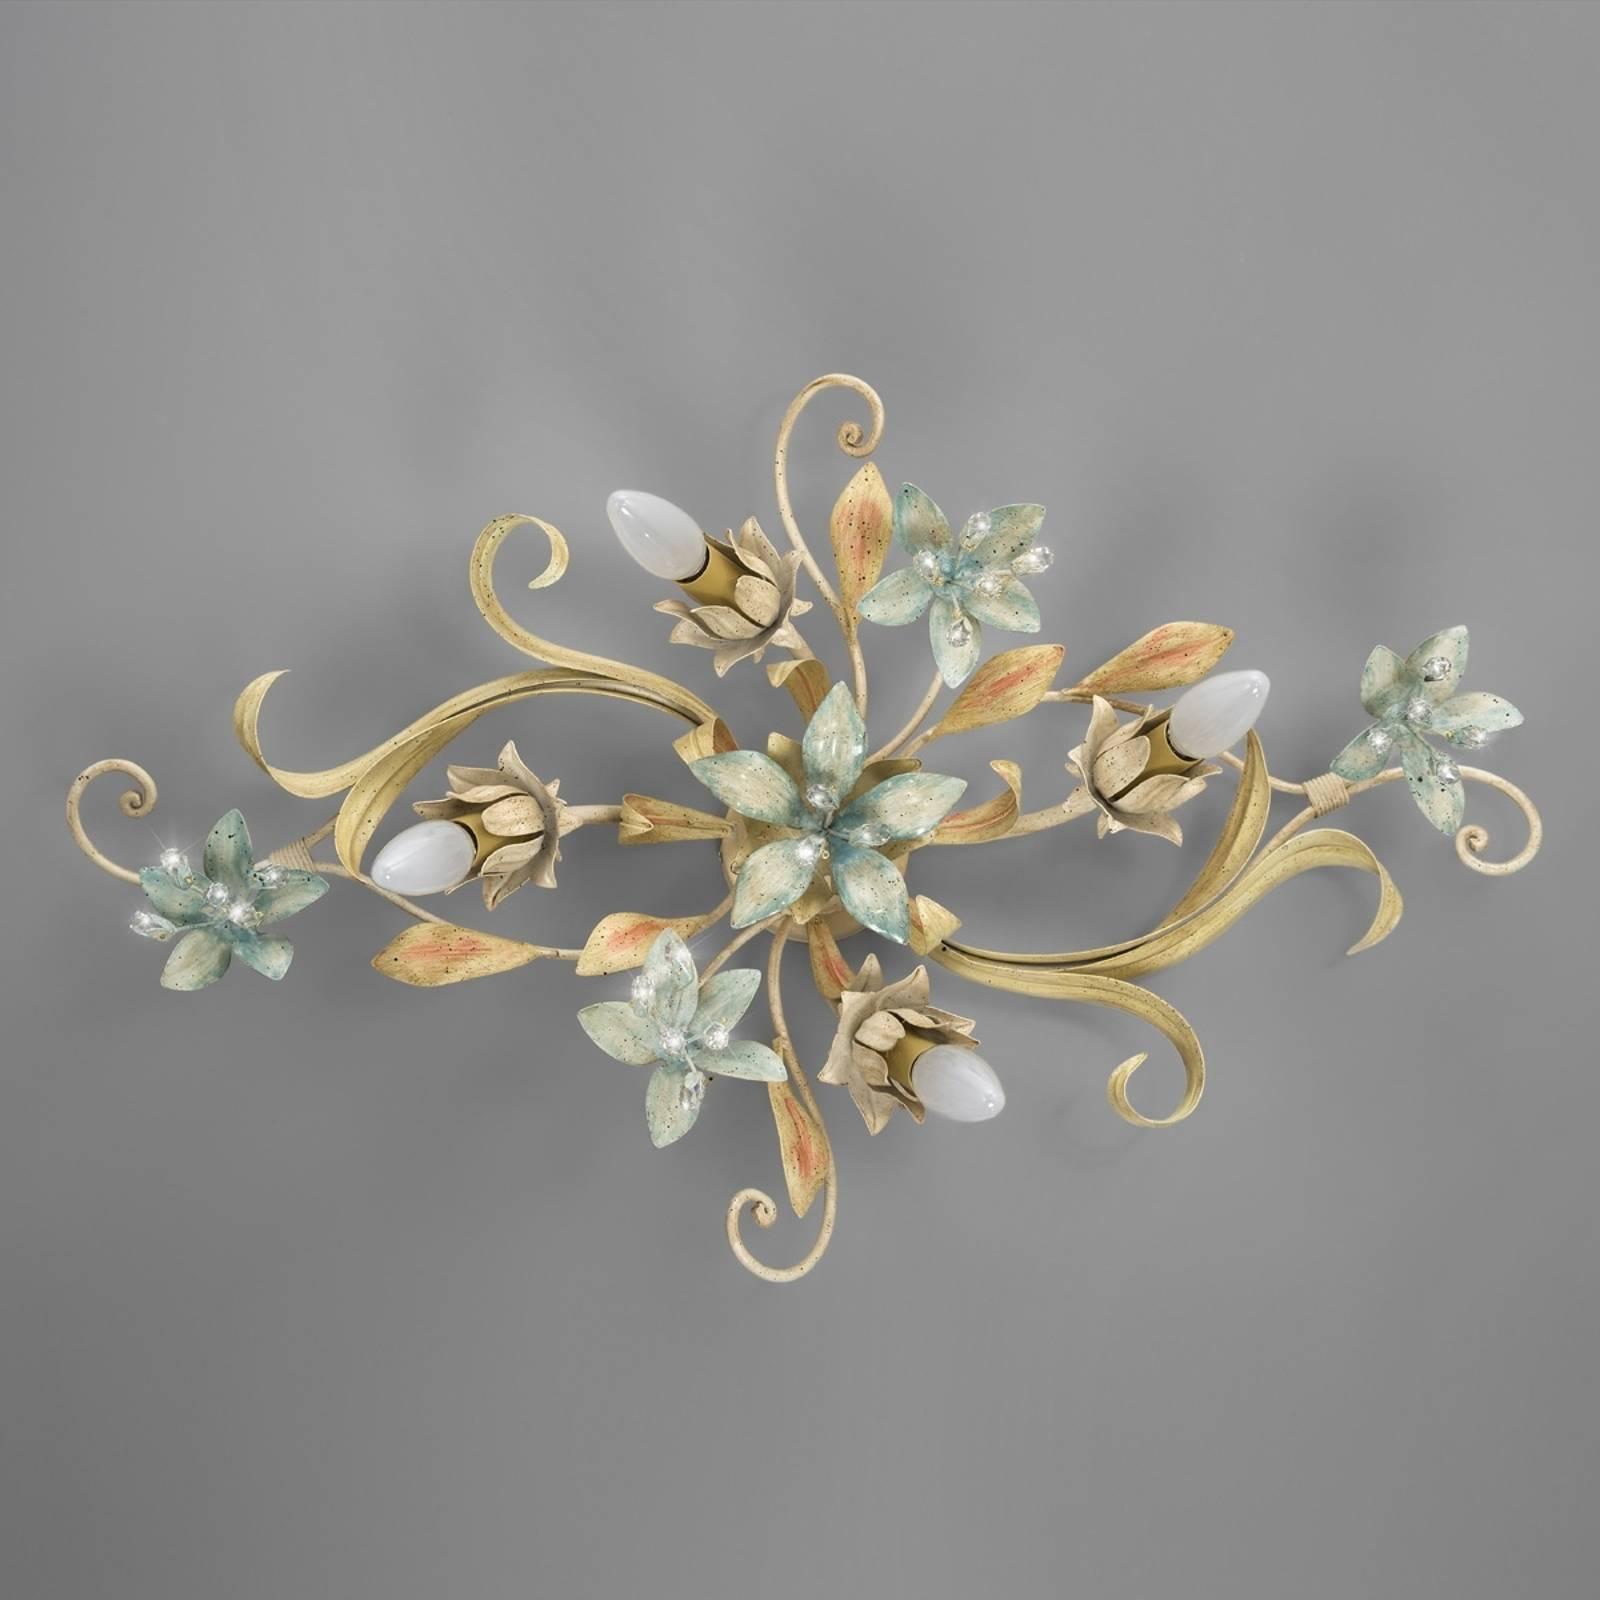 Wandlamp Lotti in Florentijnse stijl